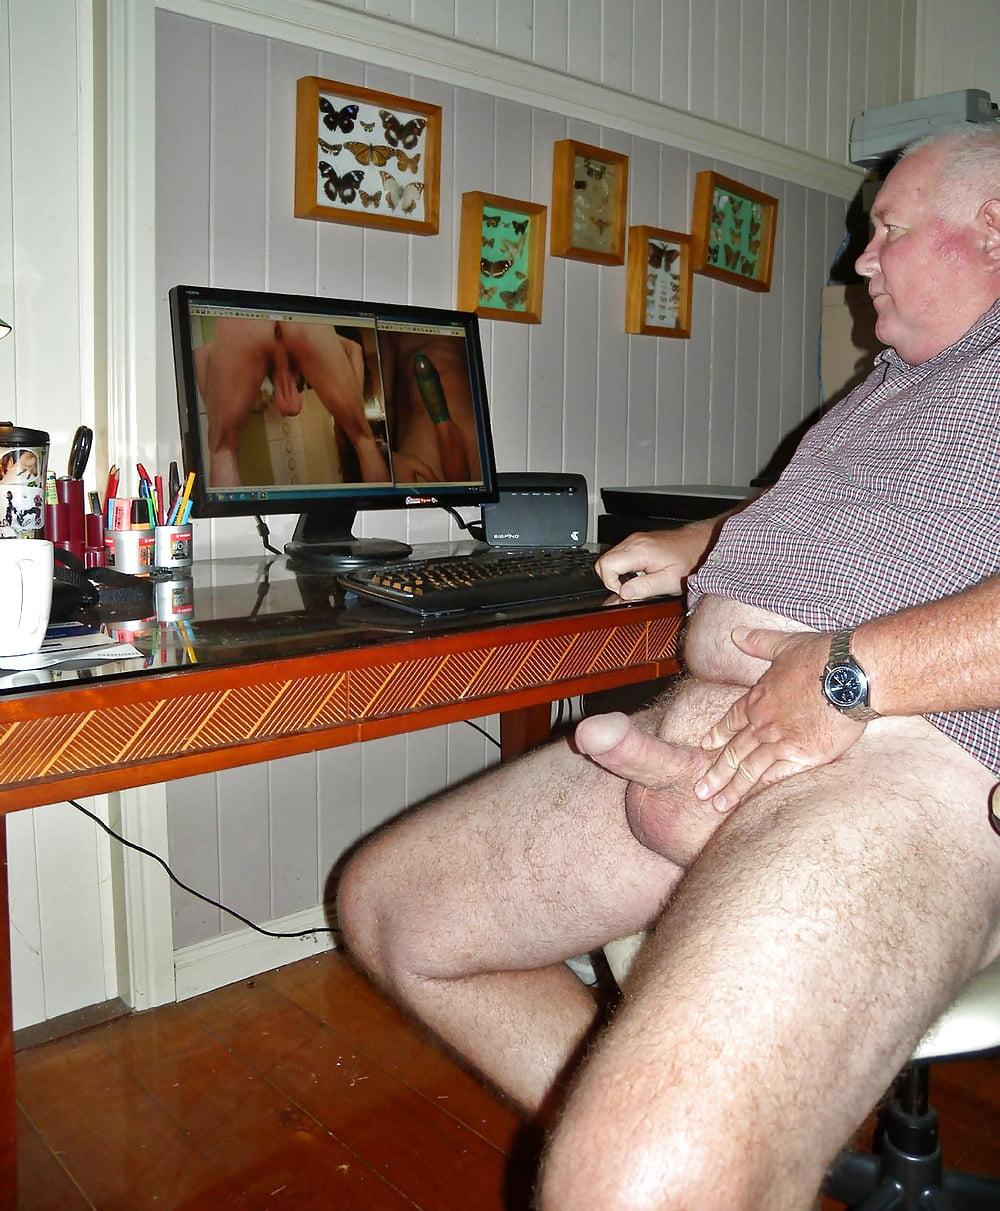 mature-men-jack-off-gallery-mom-boy-sex-videos